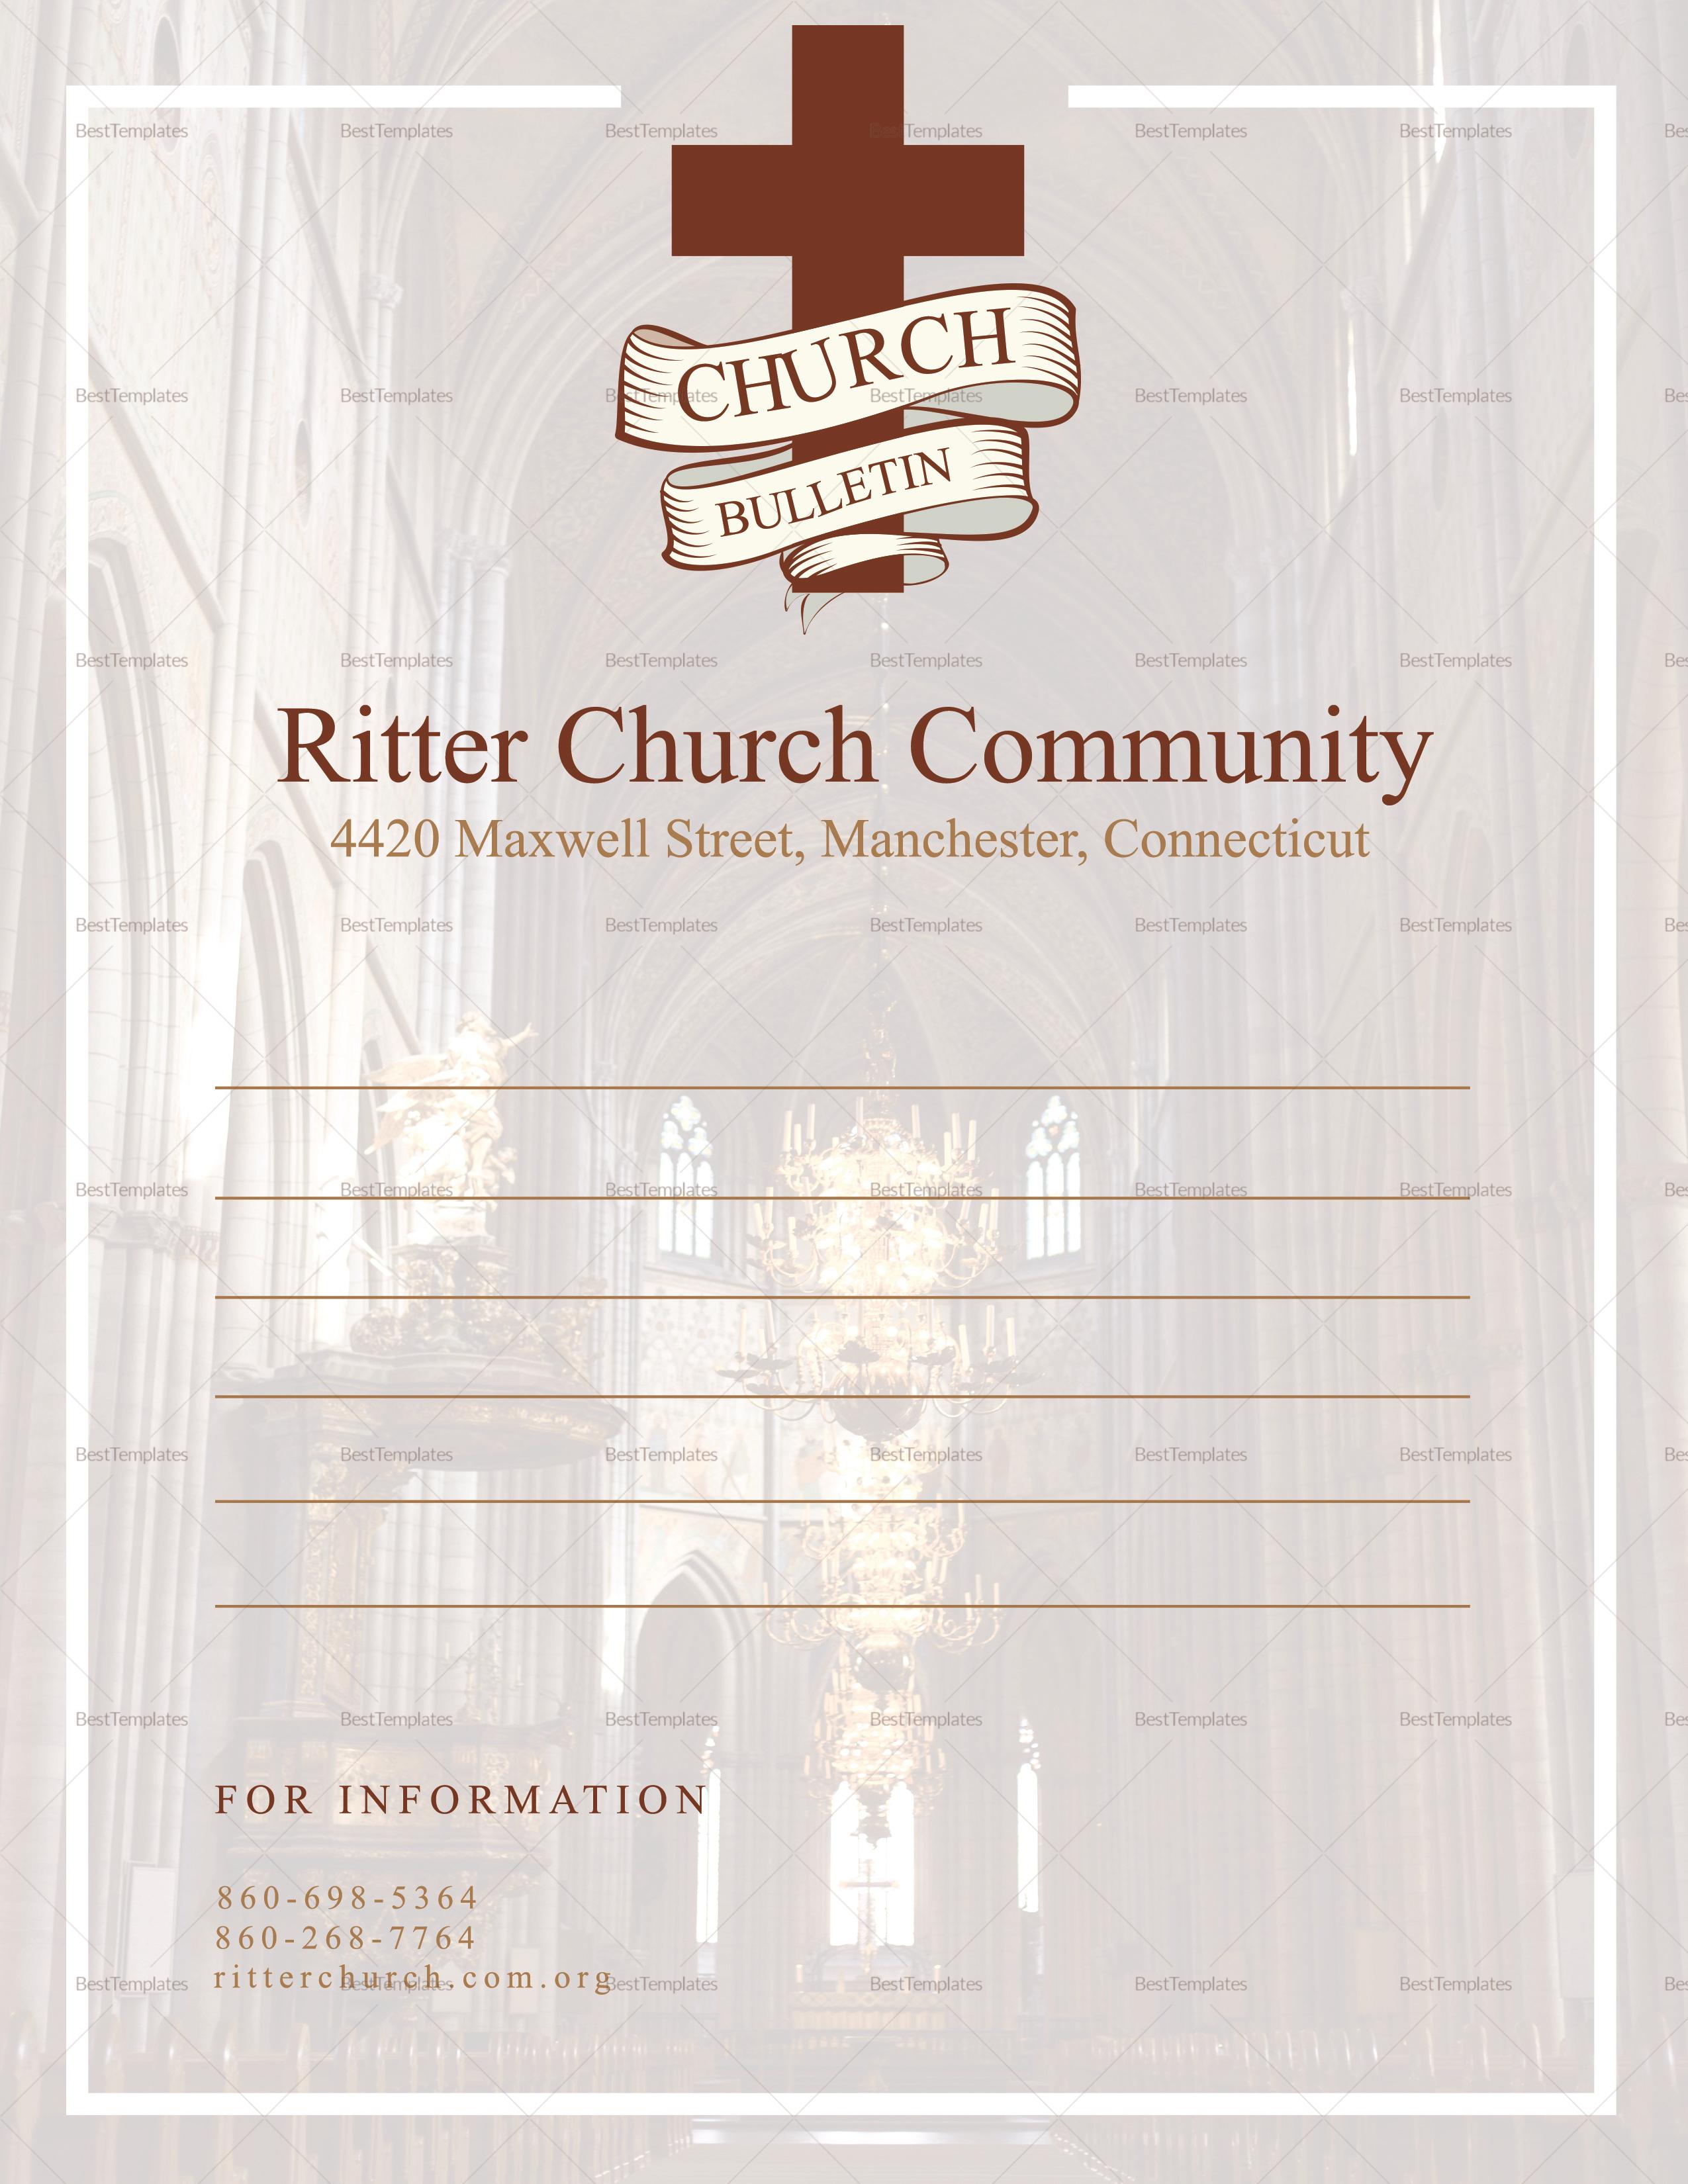 Church Bulletin and Connect Card Flyer